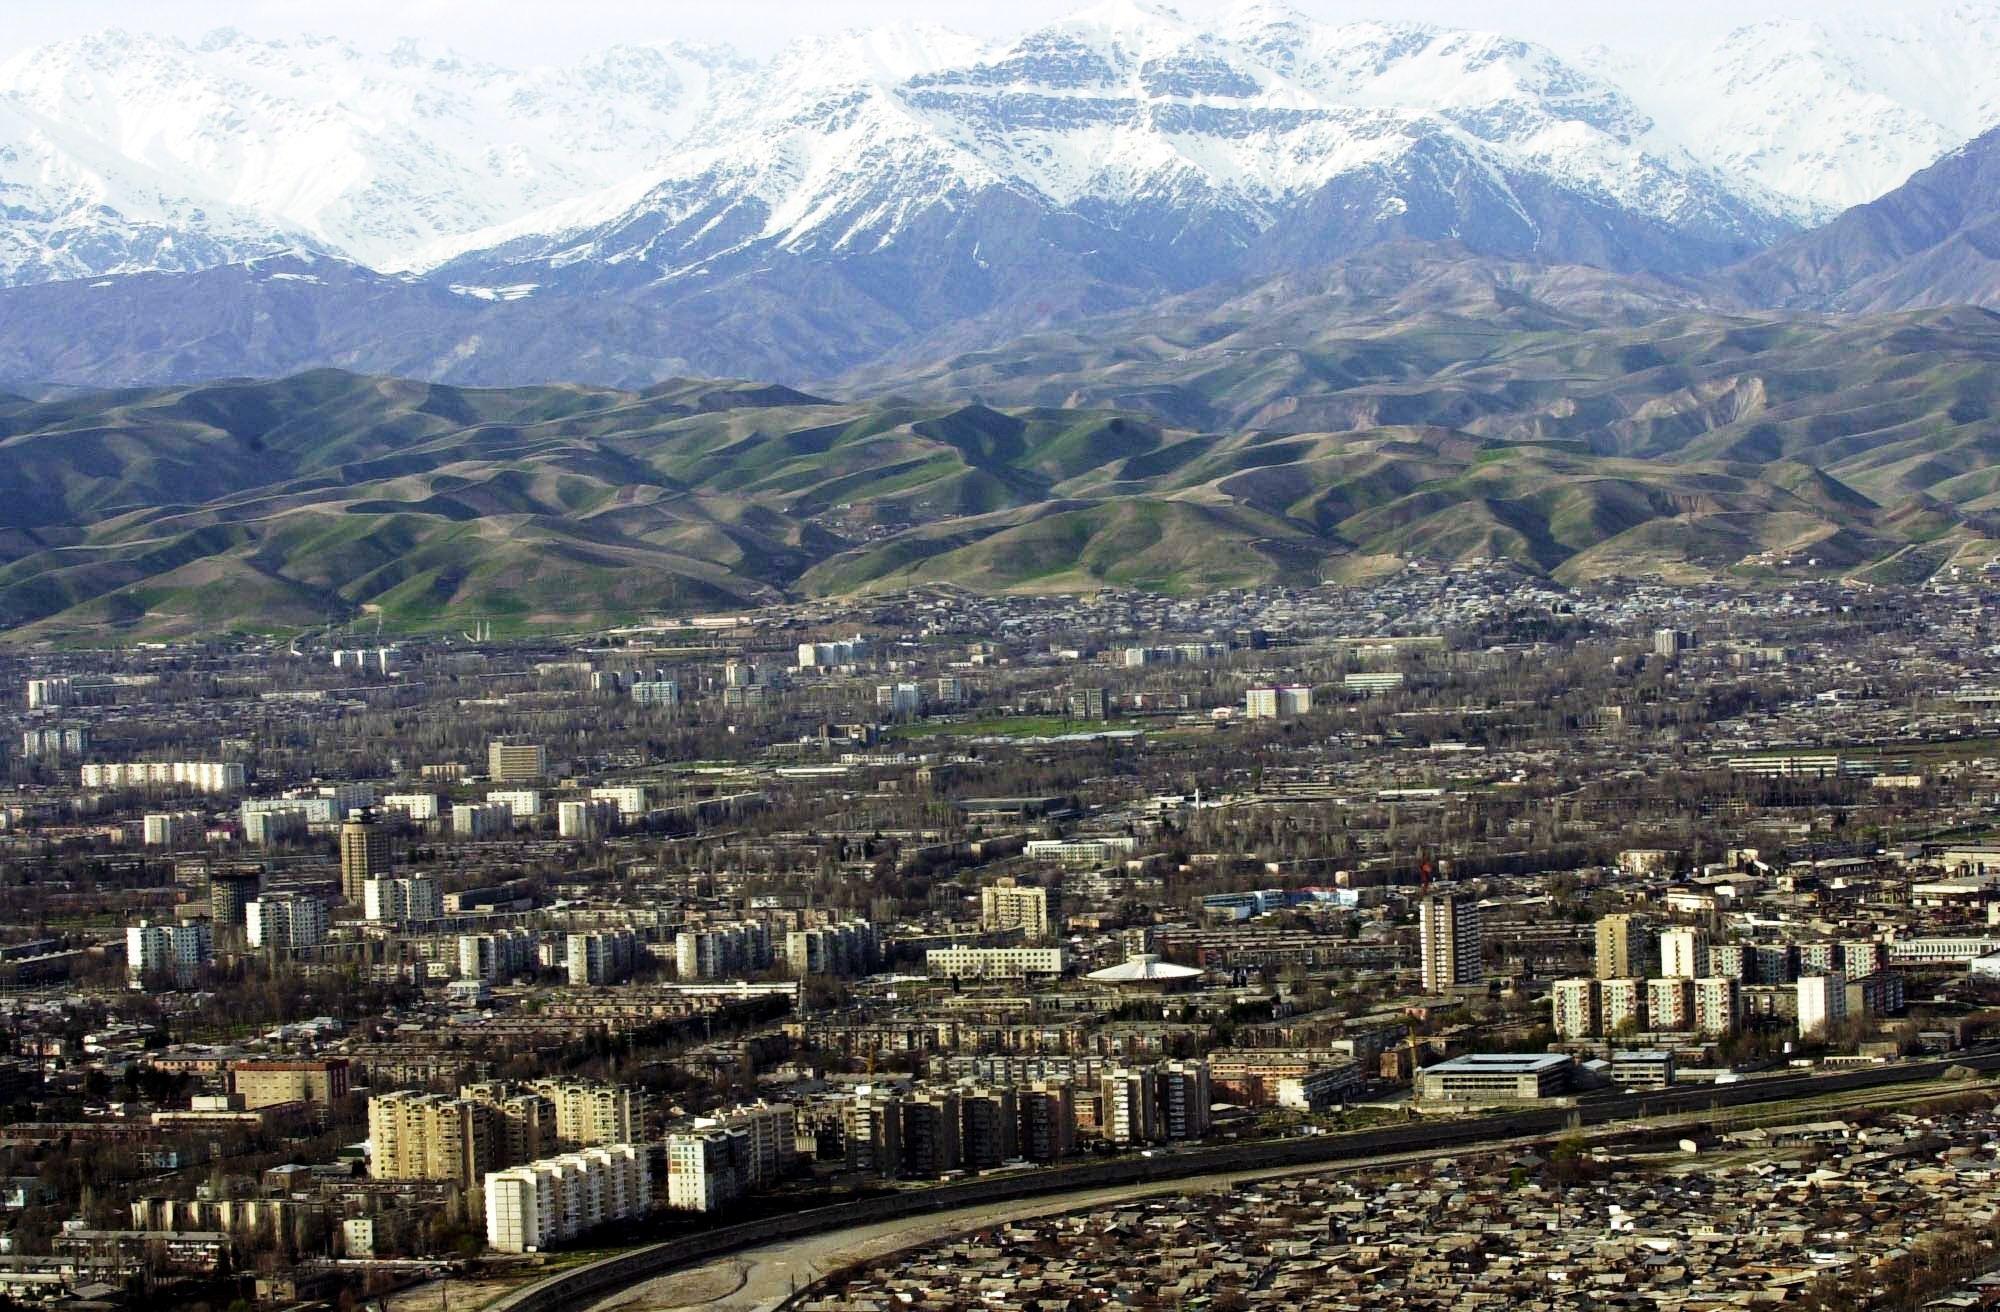 обои на таджикистан отправил почту заказ